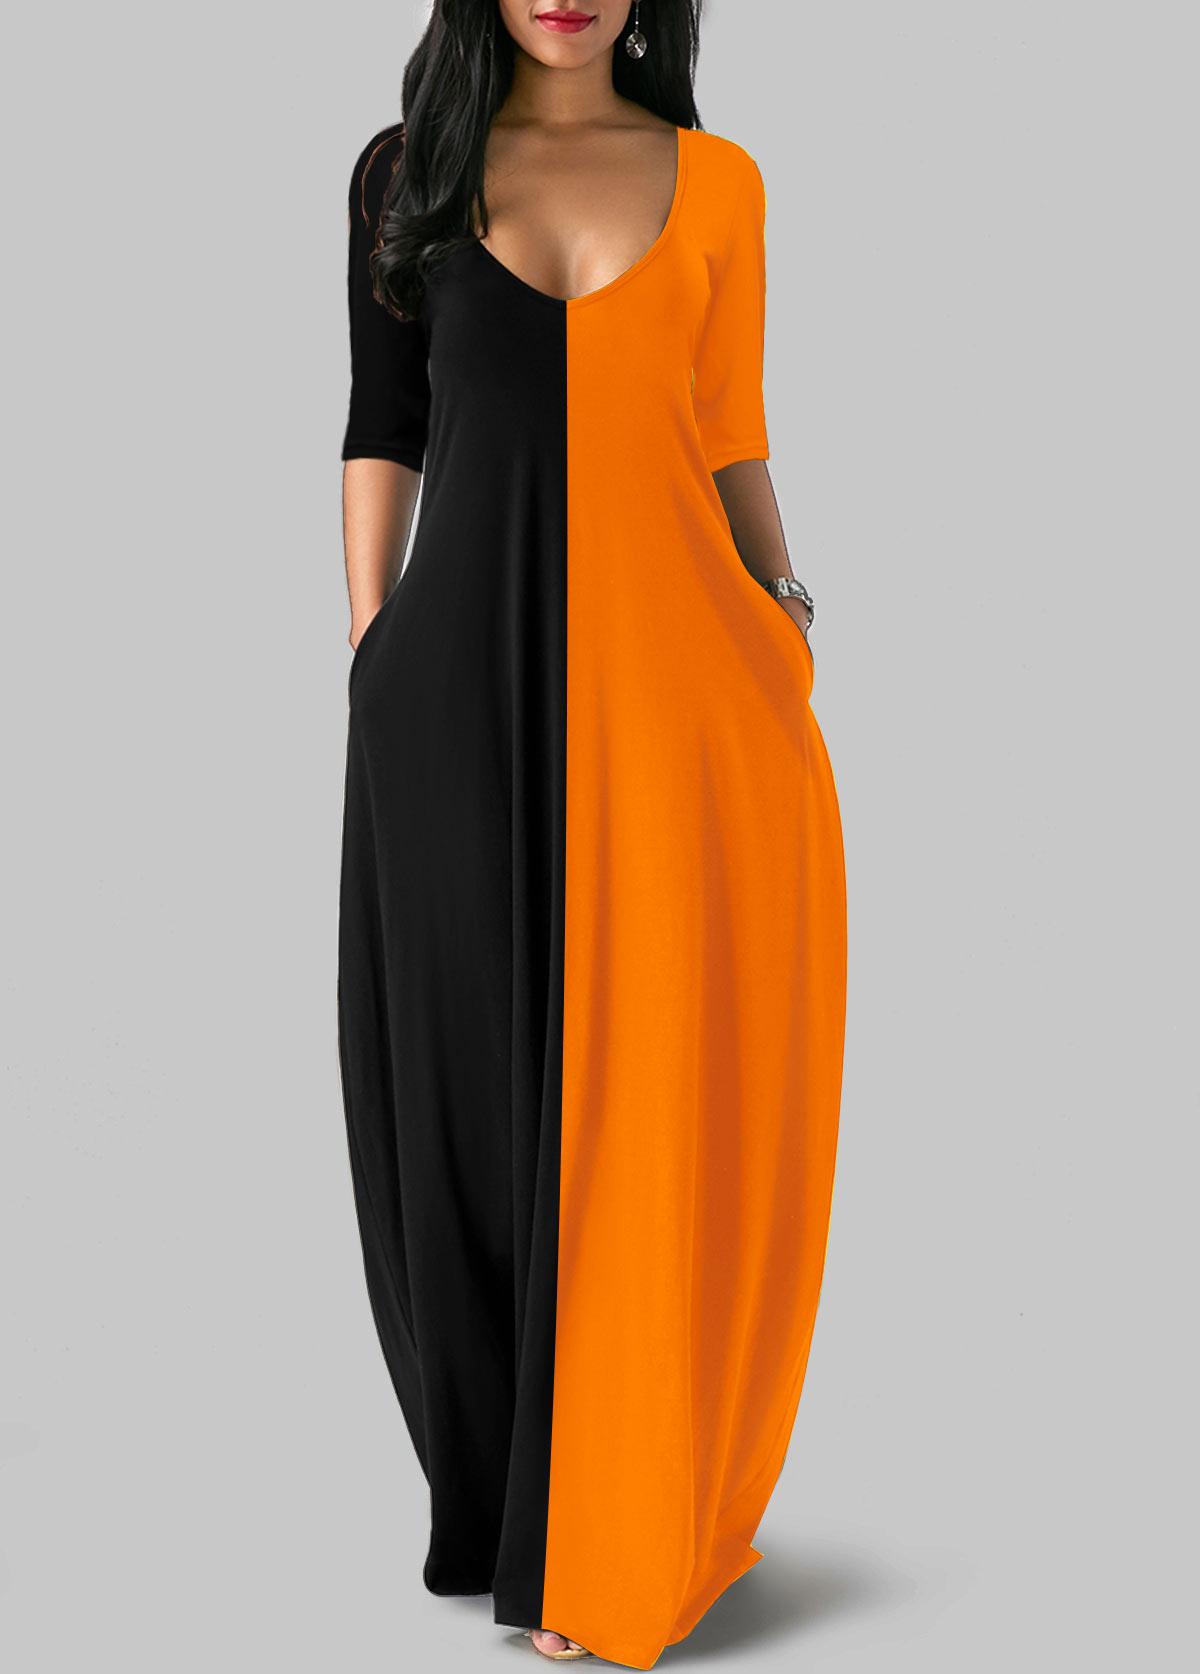 Plunging Neck Color Block Three Quarter Sleeve Maxi Dress